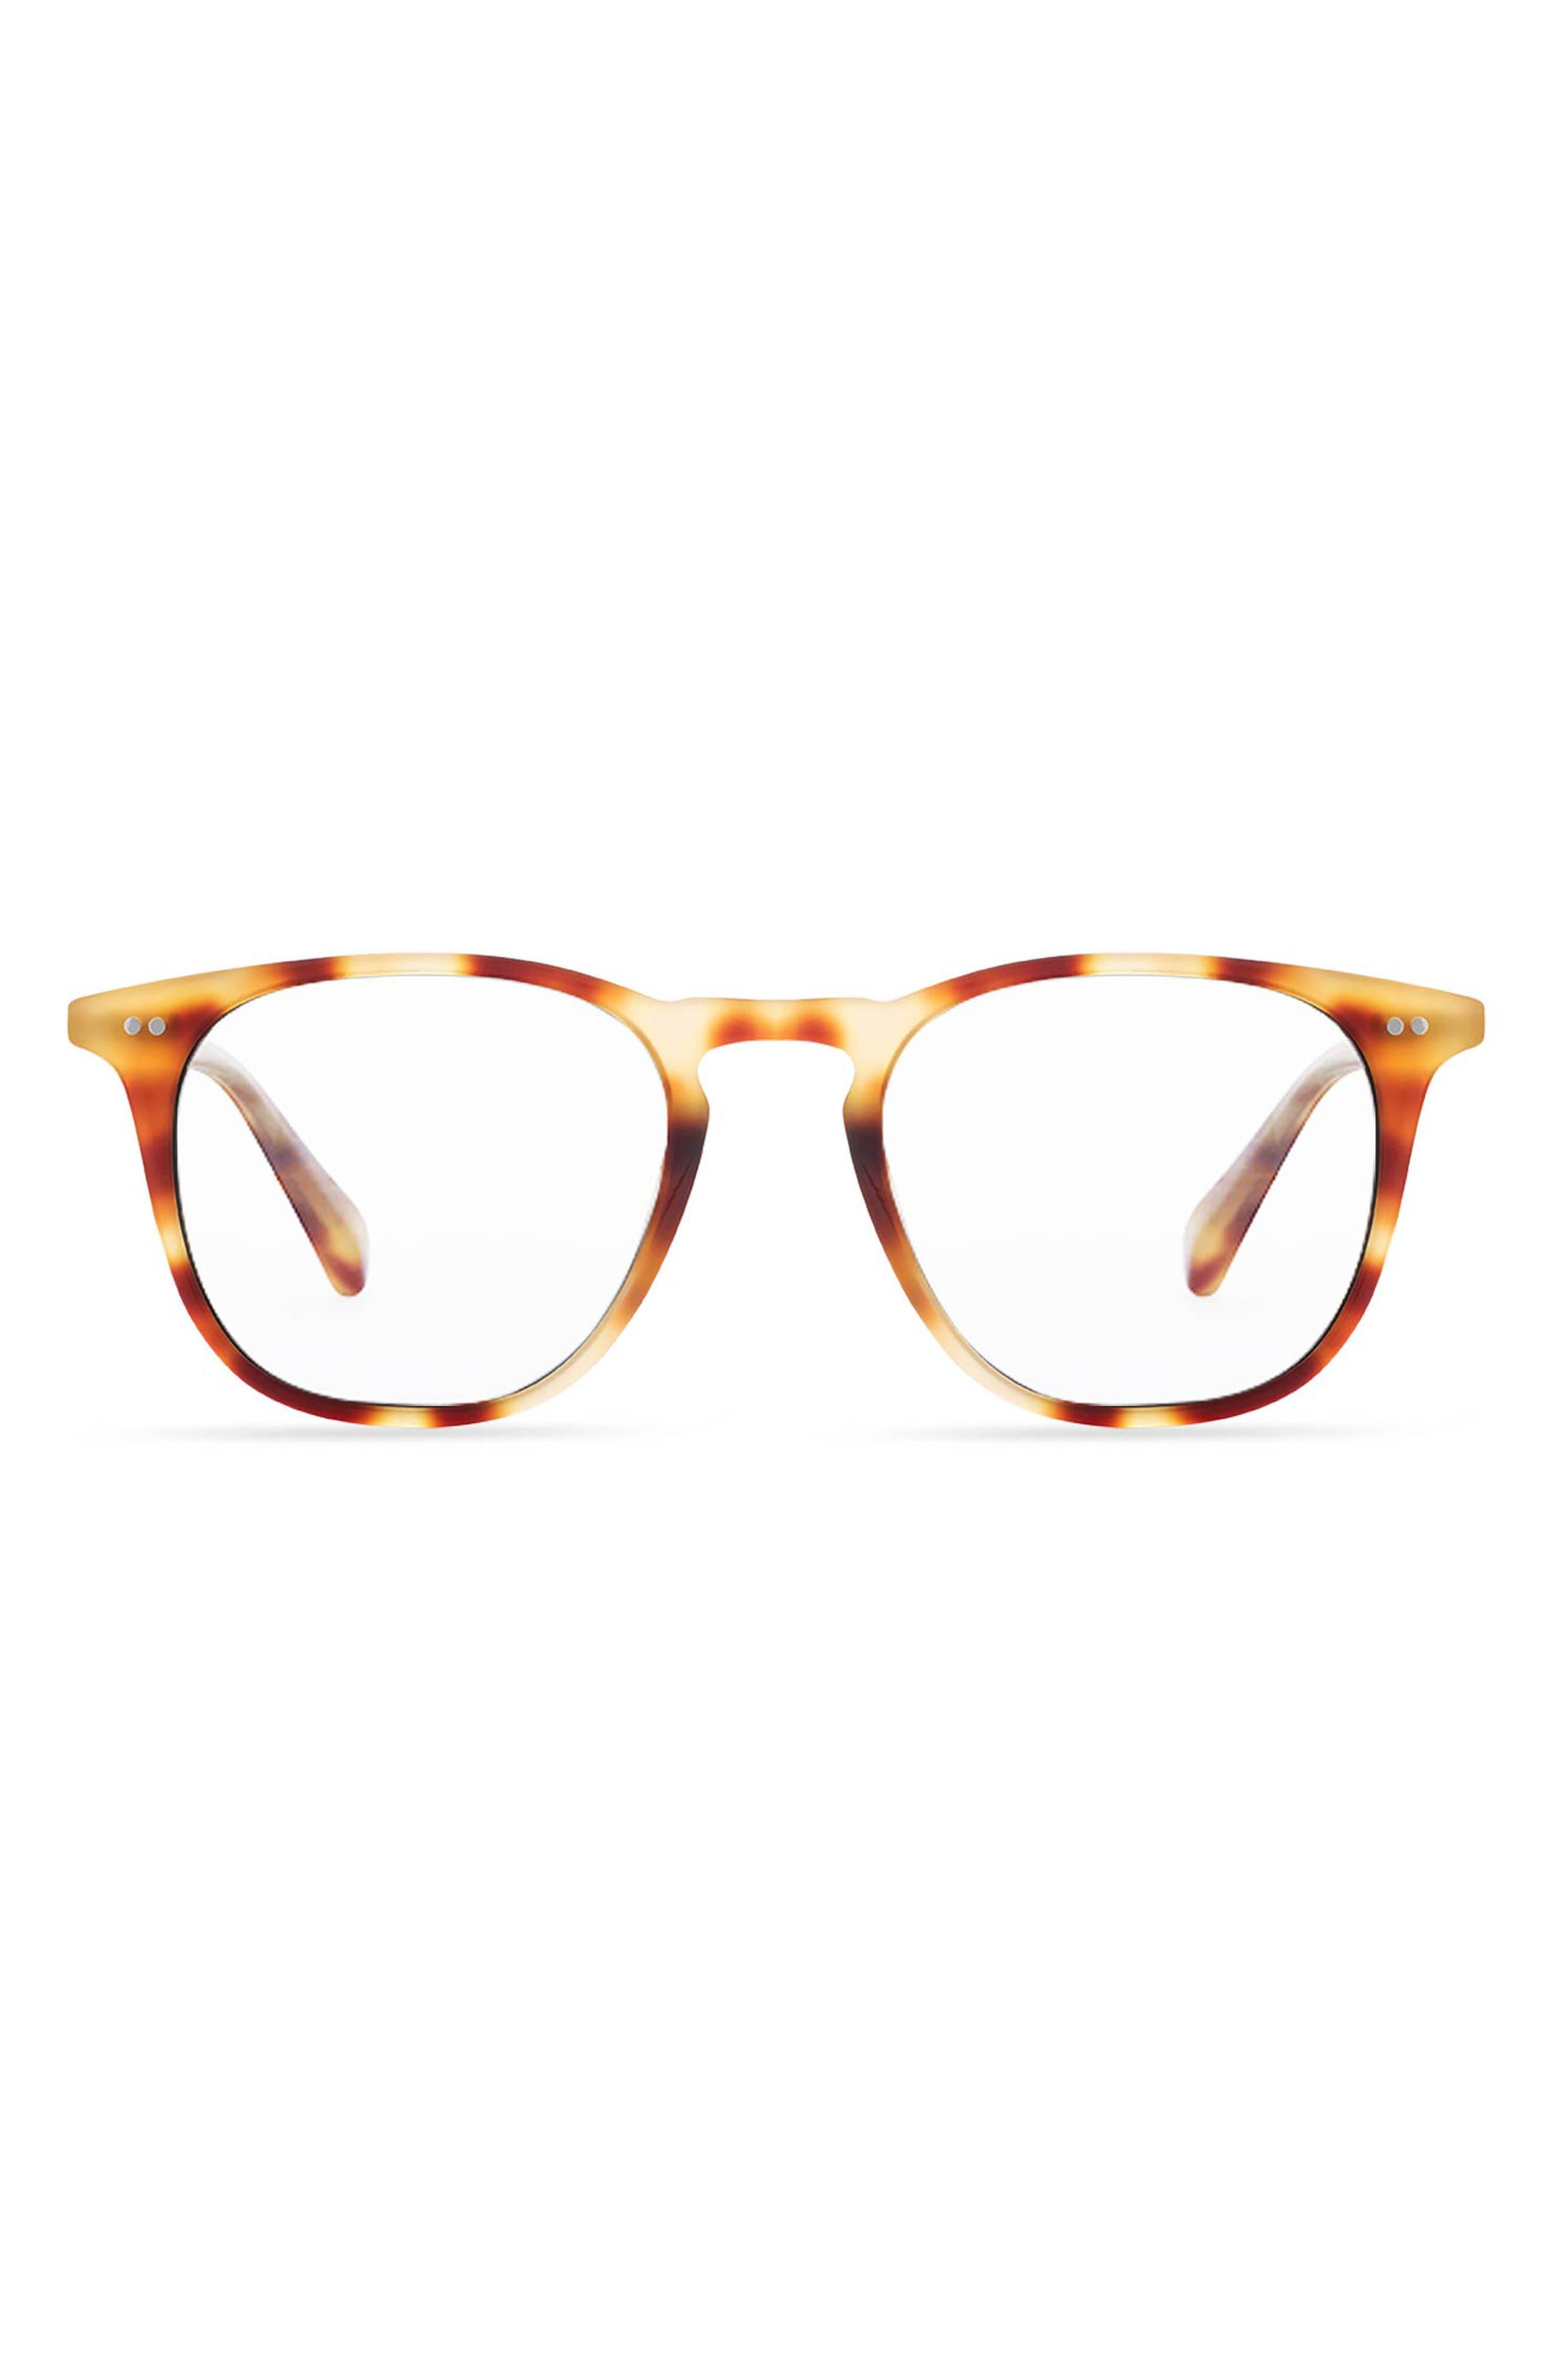 Maxwell 49mm Blue Light Blocking Square Reading Glasses